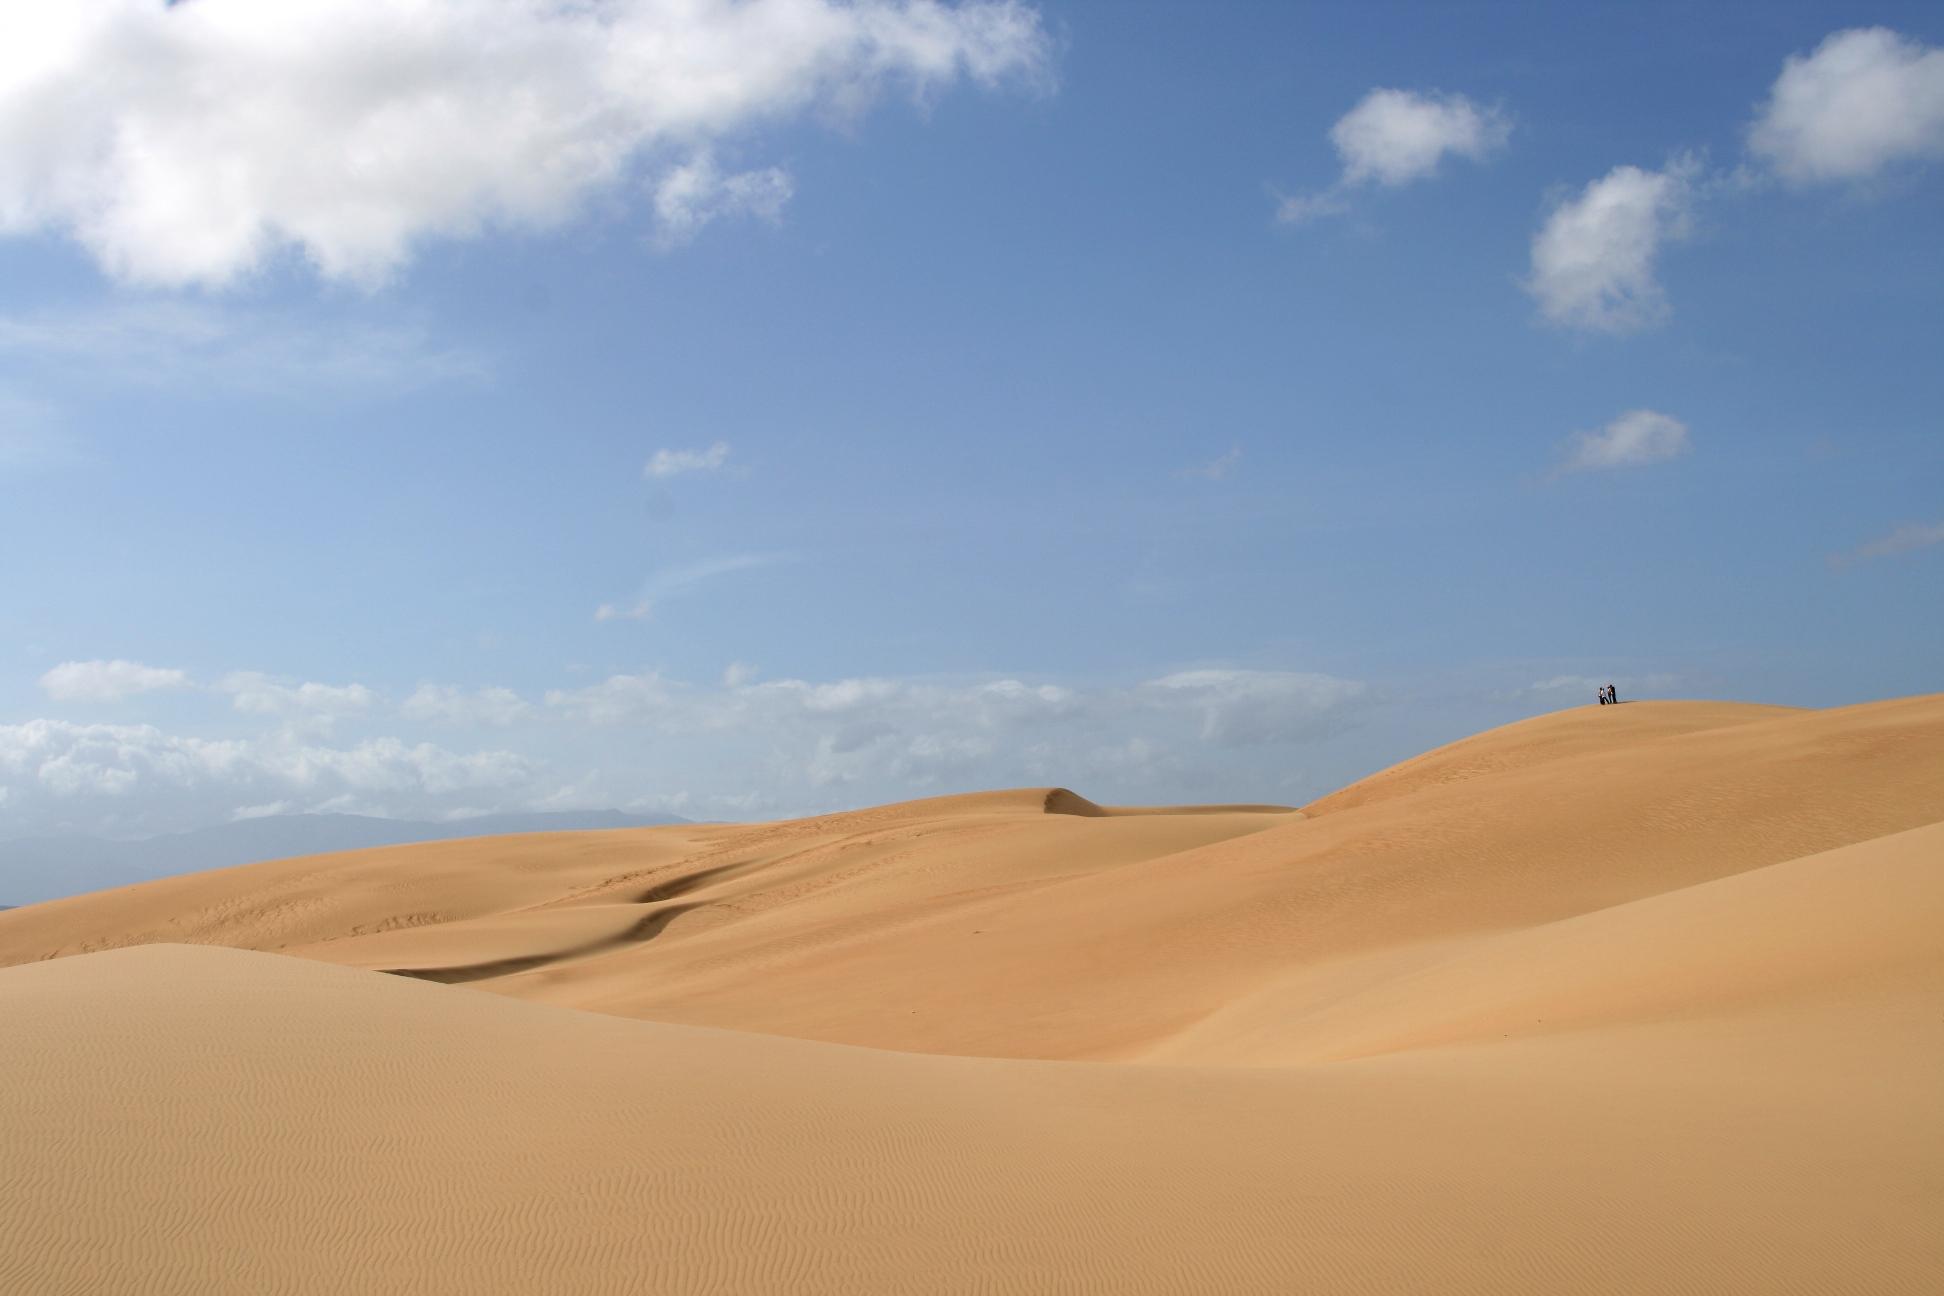 Medanos de Coro, sand dunes venezuela, coro venezuela, coro sand dunes, venezuela tourist attractions